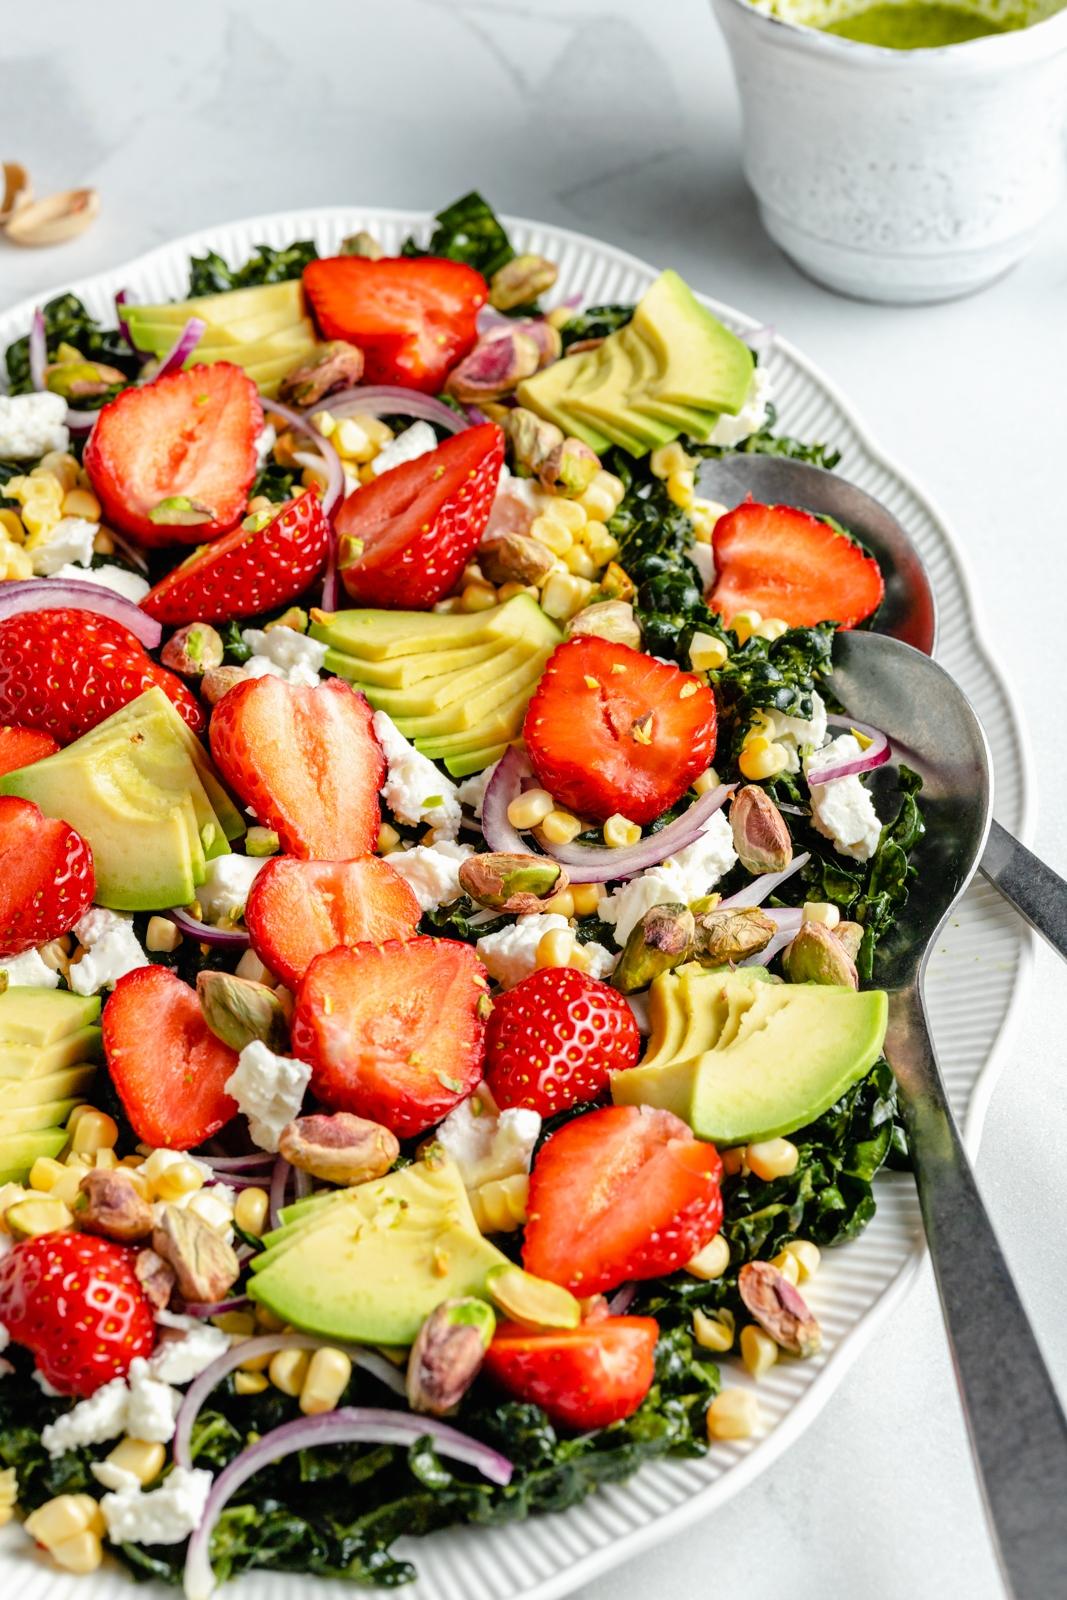 strawberry kale salad on a platter